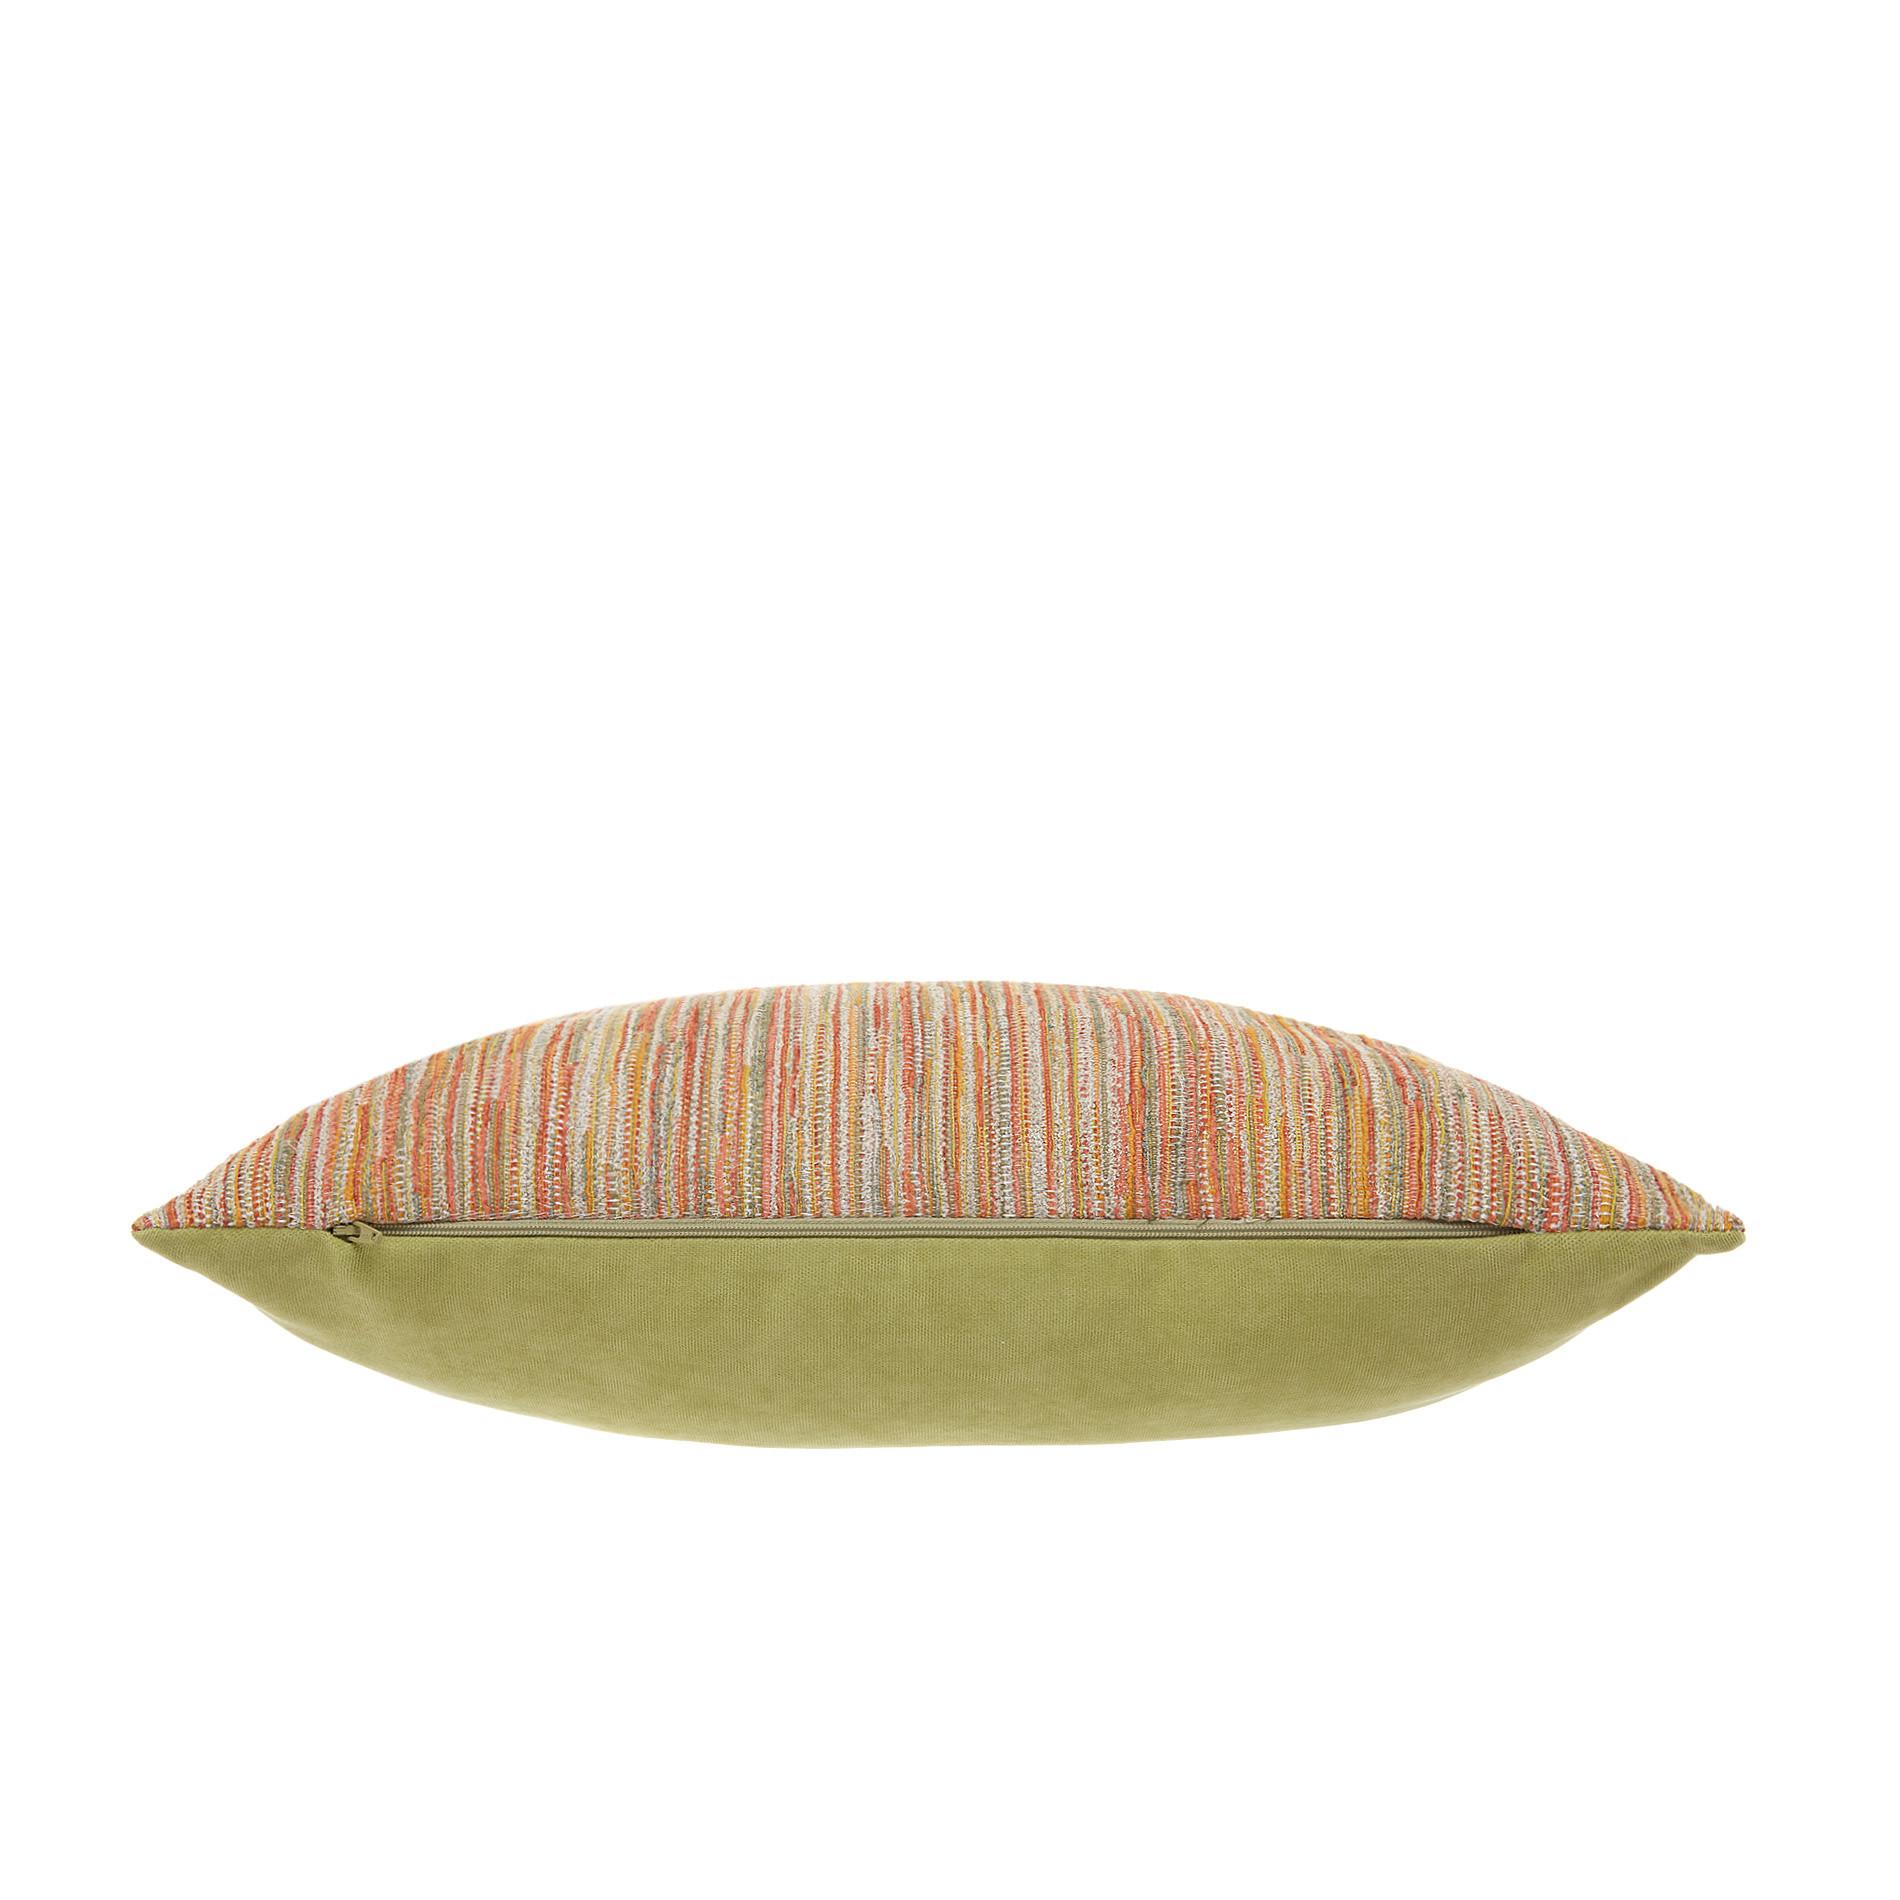 Cuscino jacquard motivo fili 45x45cm, Multicolor, large image number 1